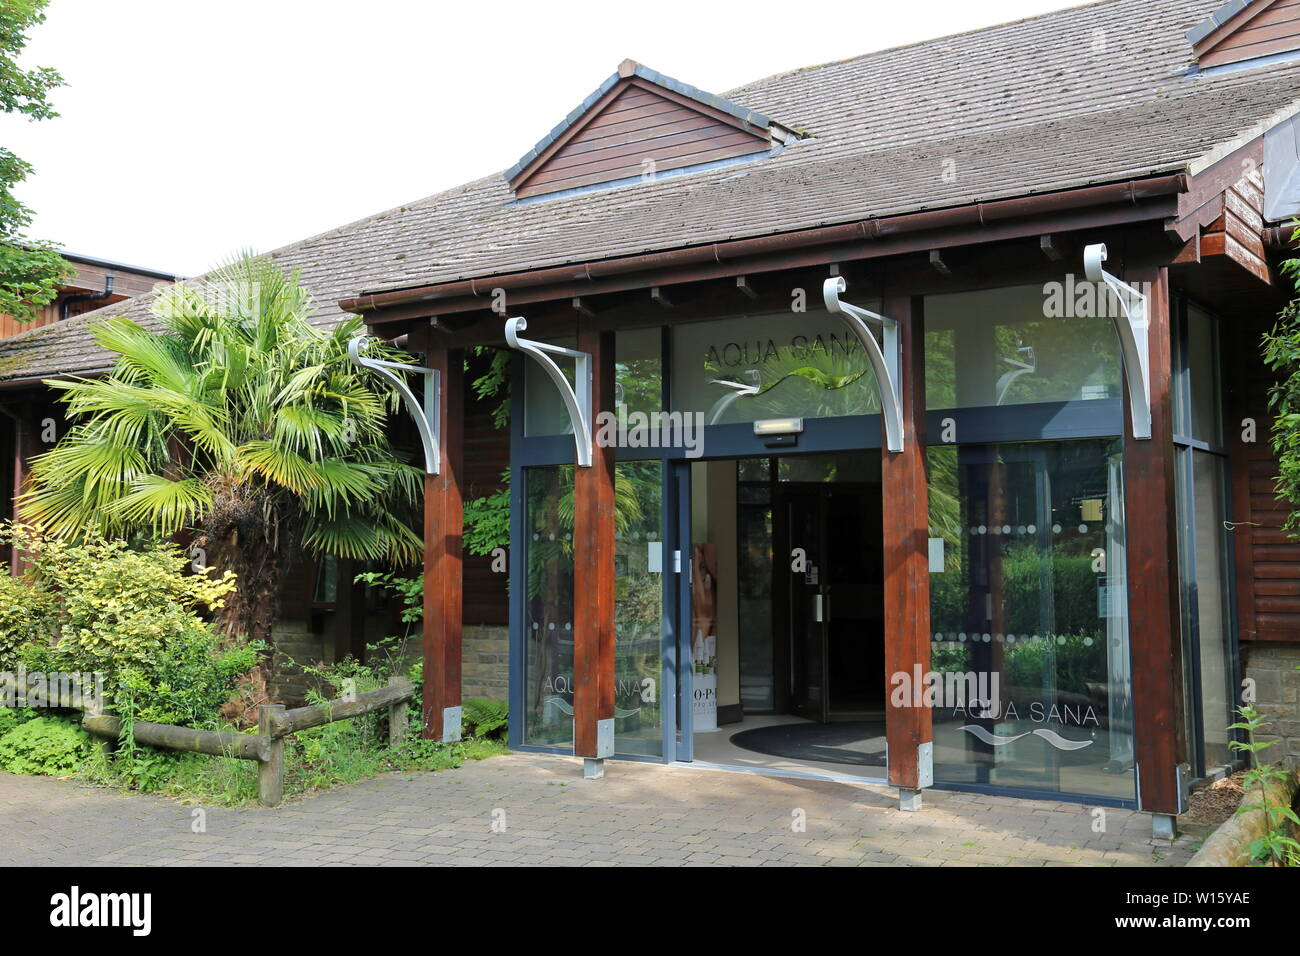 Aqua Sana Spa Entrance Center Parcs Elveden Forest Brandon